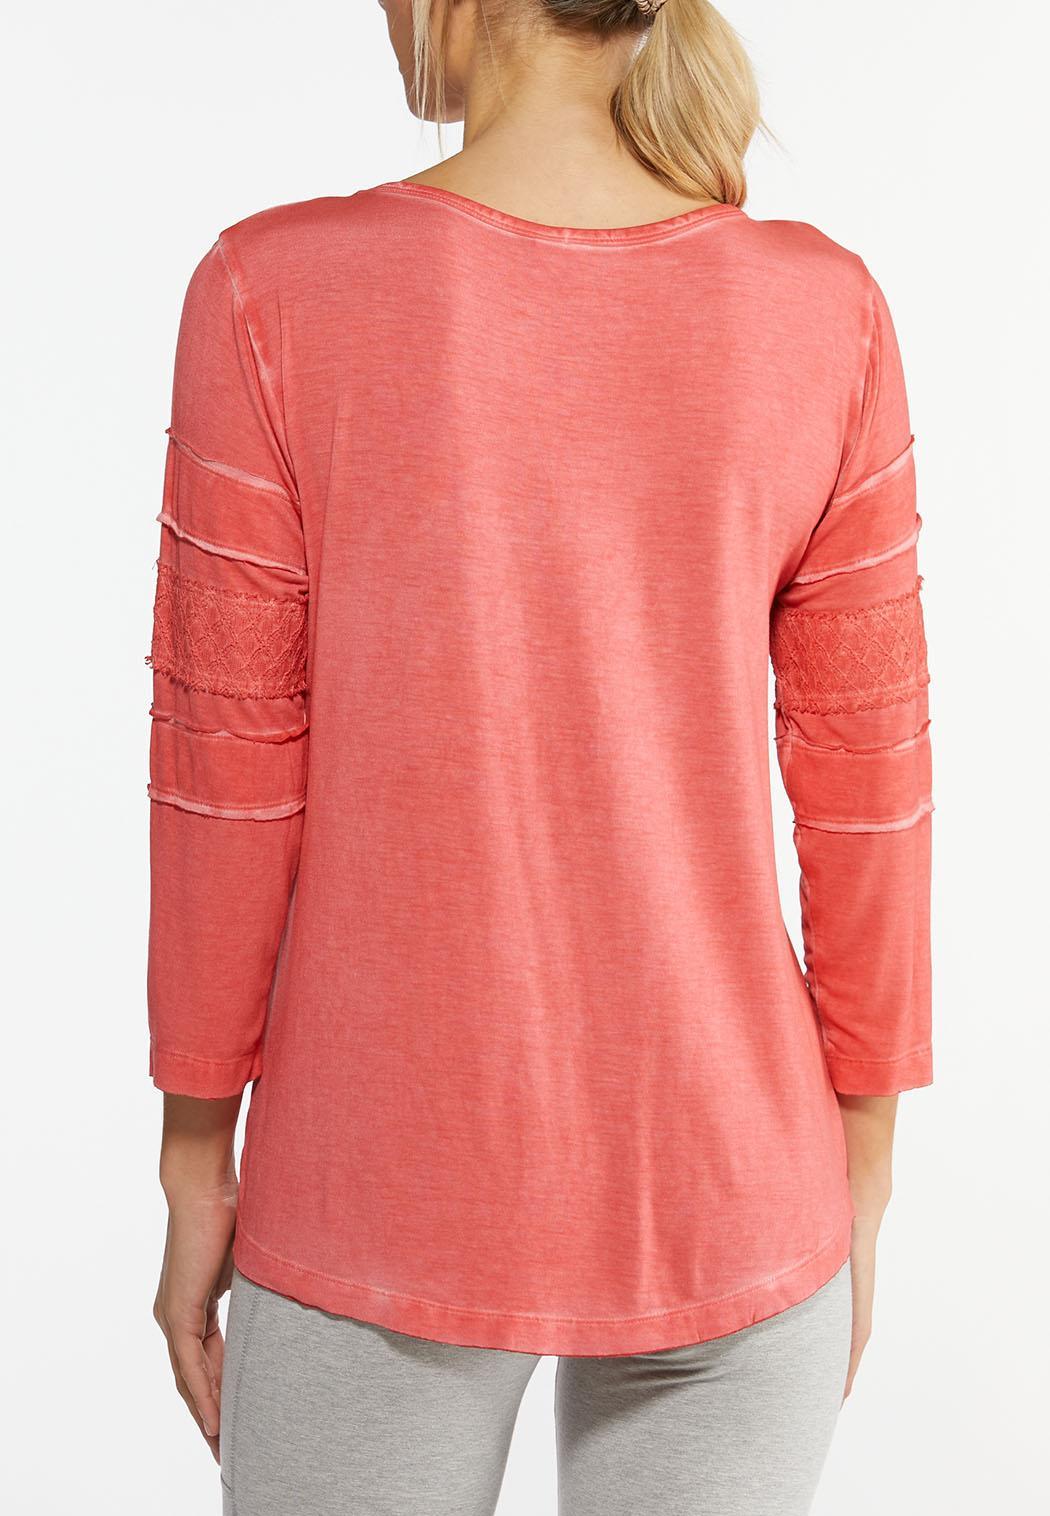 Orange Crochet Sleeve Top (Item #44462658)